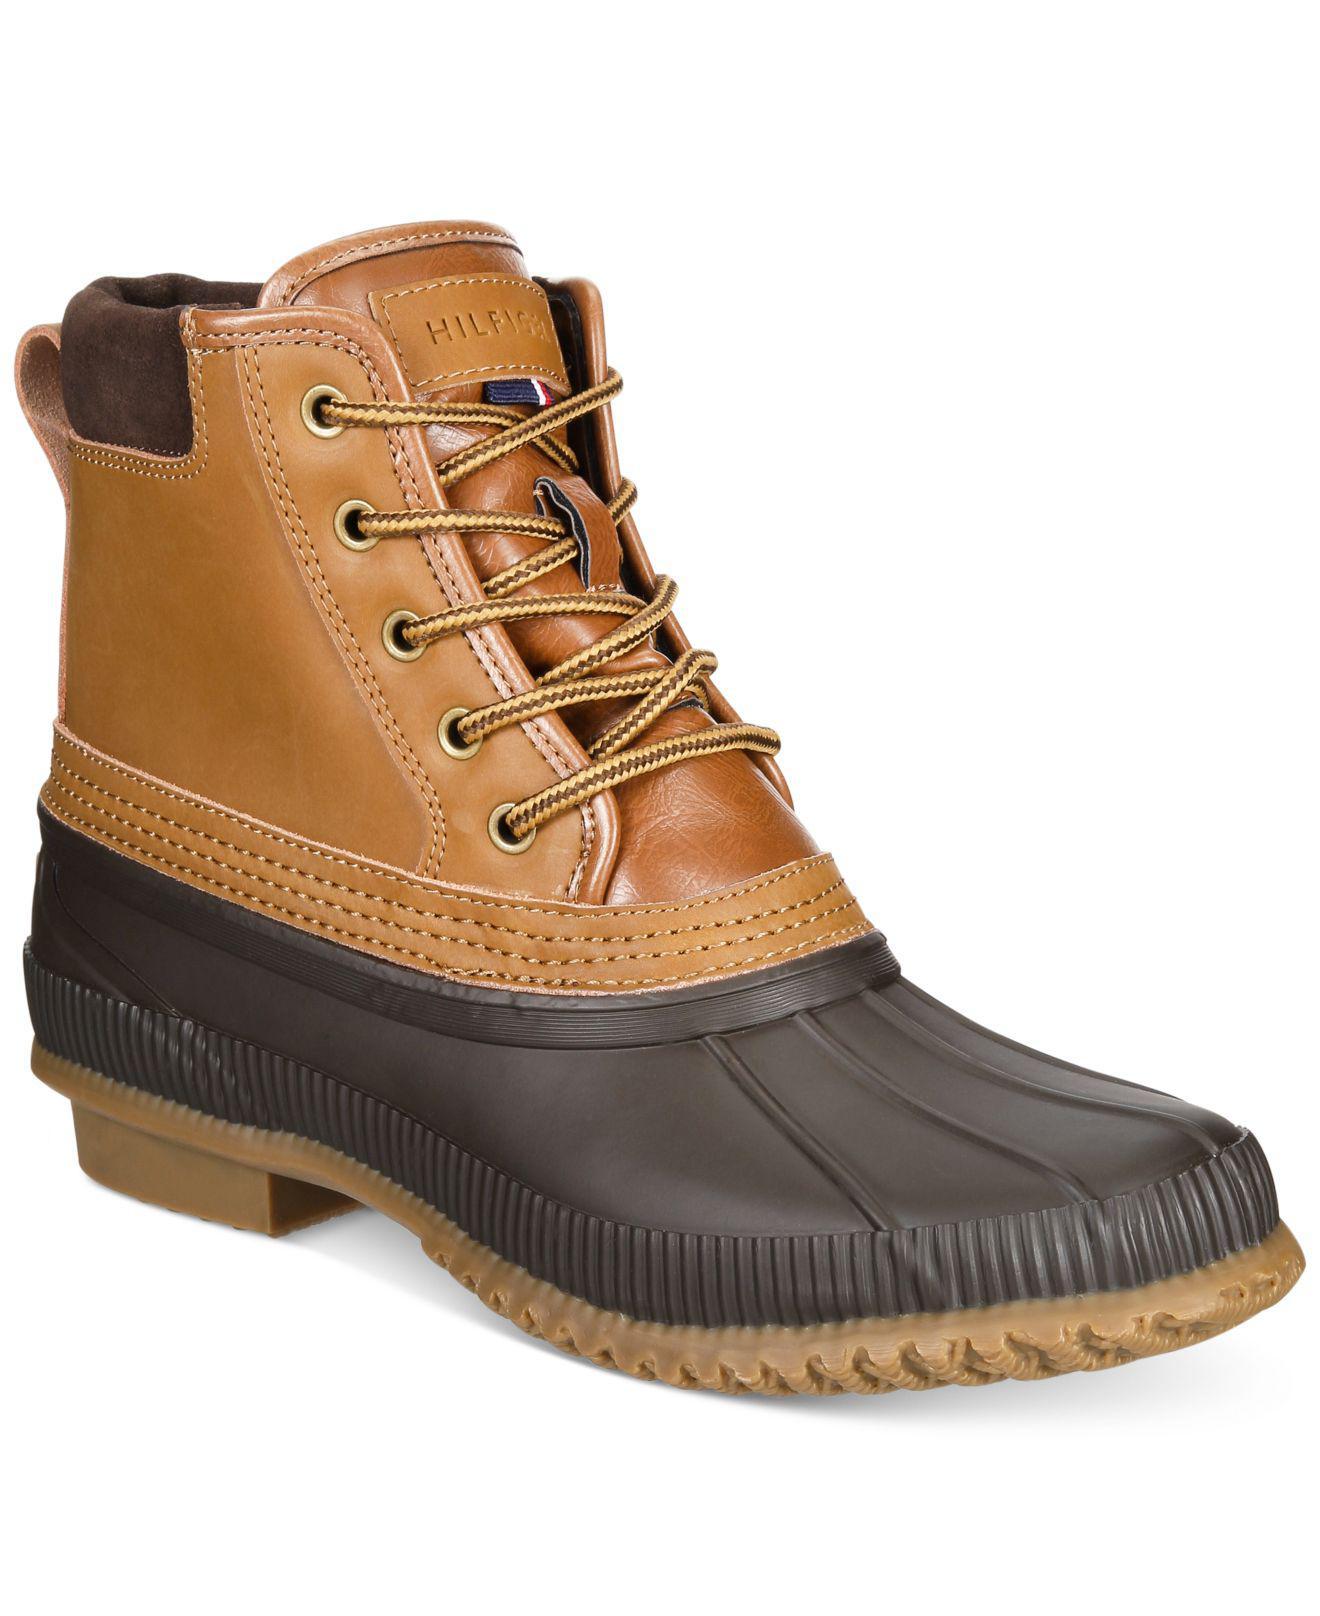 39734219d1a5a1 Lyst - Tommy Hilfiger Men s Casey Waterproof Duck Boots